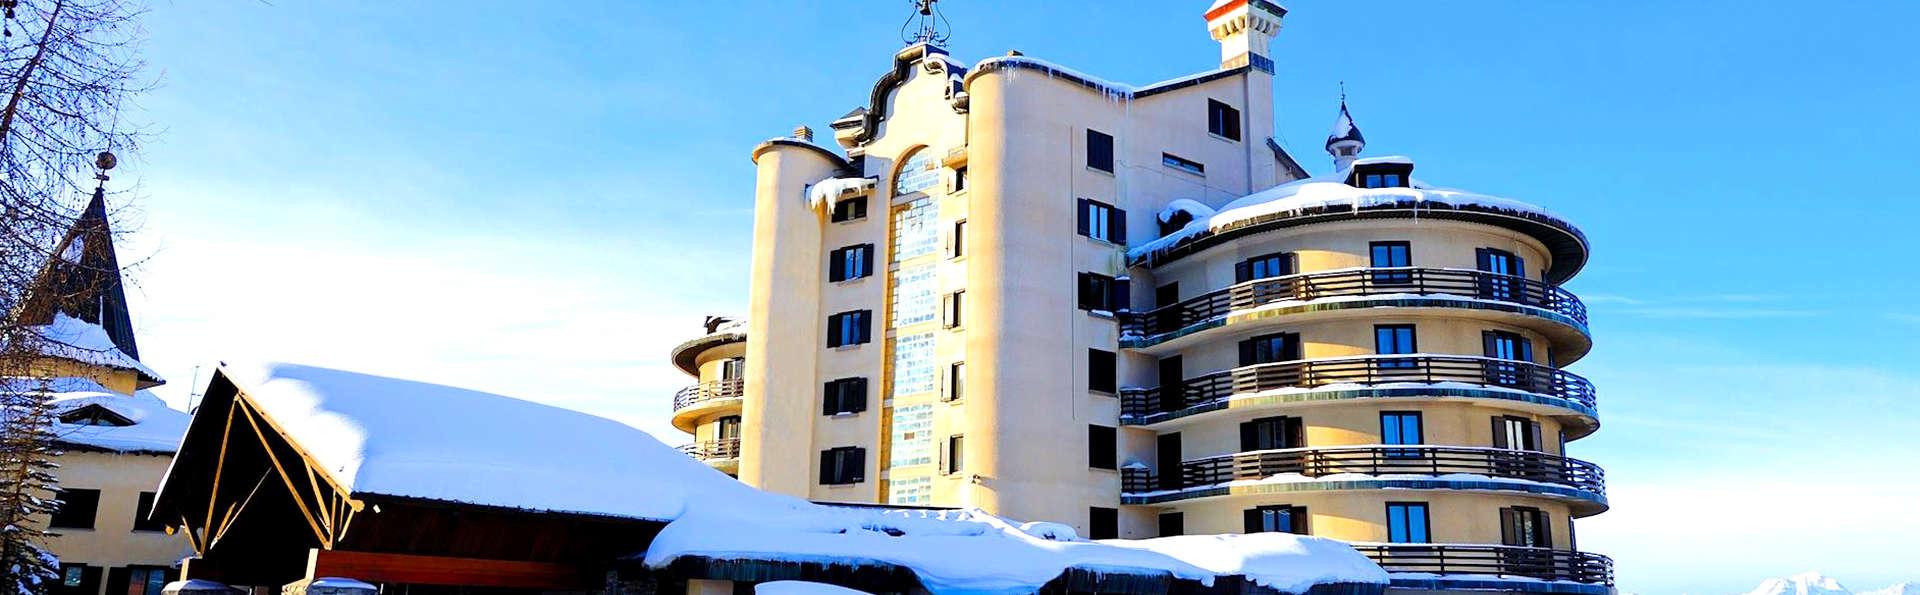 Hotel Principi di Piemonte - Edit_Front.jpg